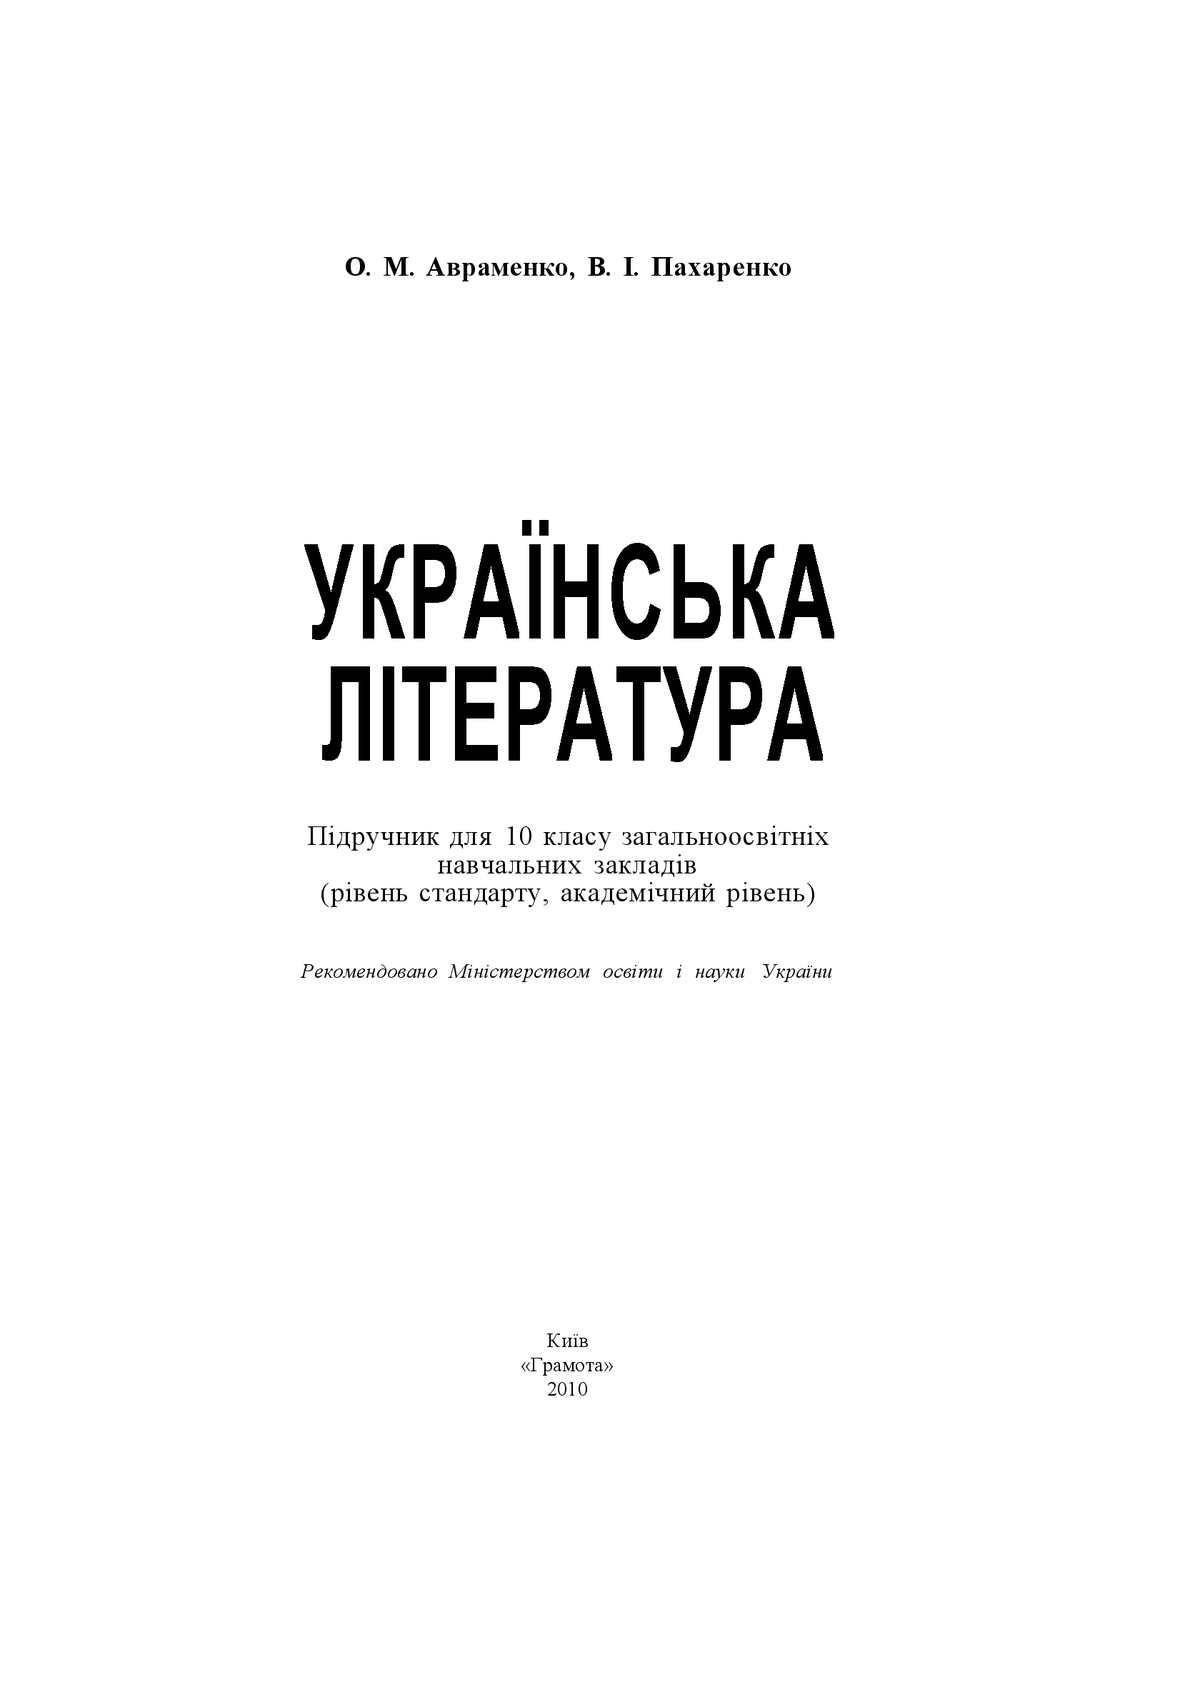 Calaméo - Українська література 10 клас Авраменко fc261dd88fd01